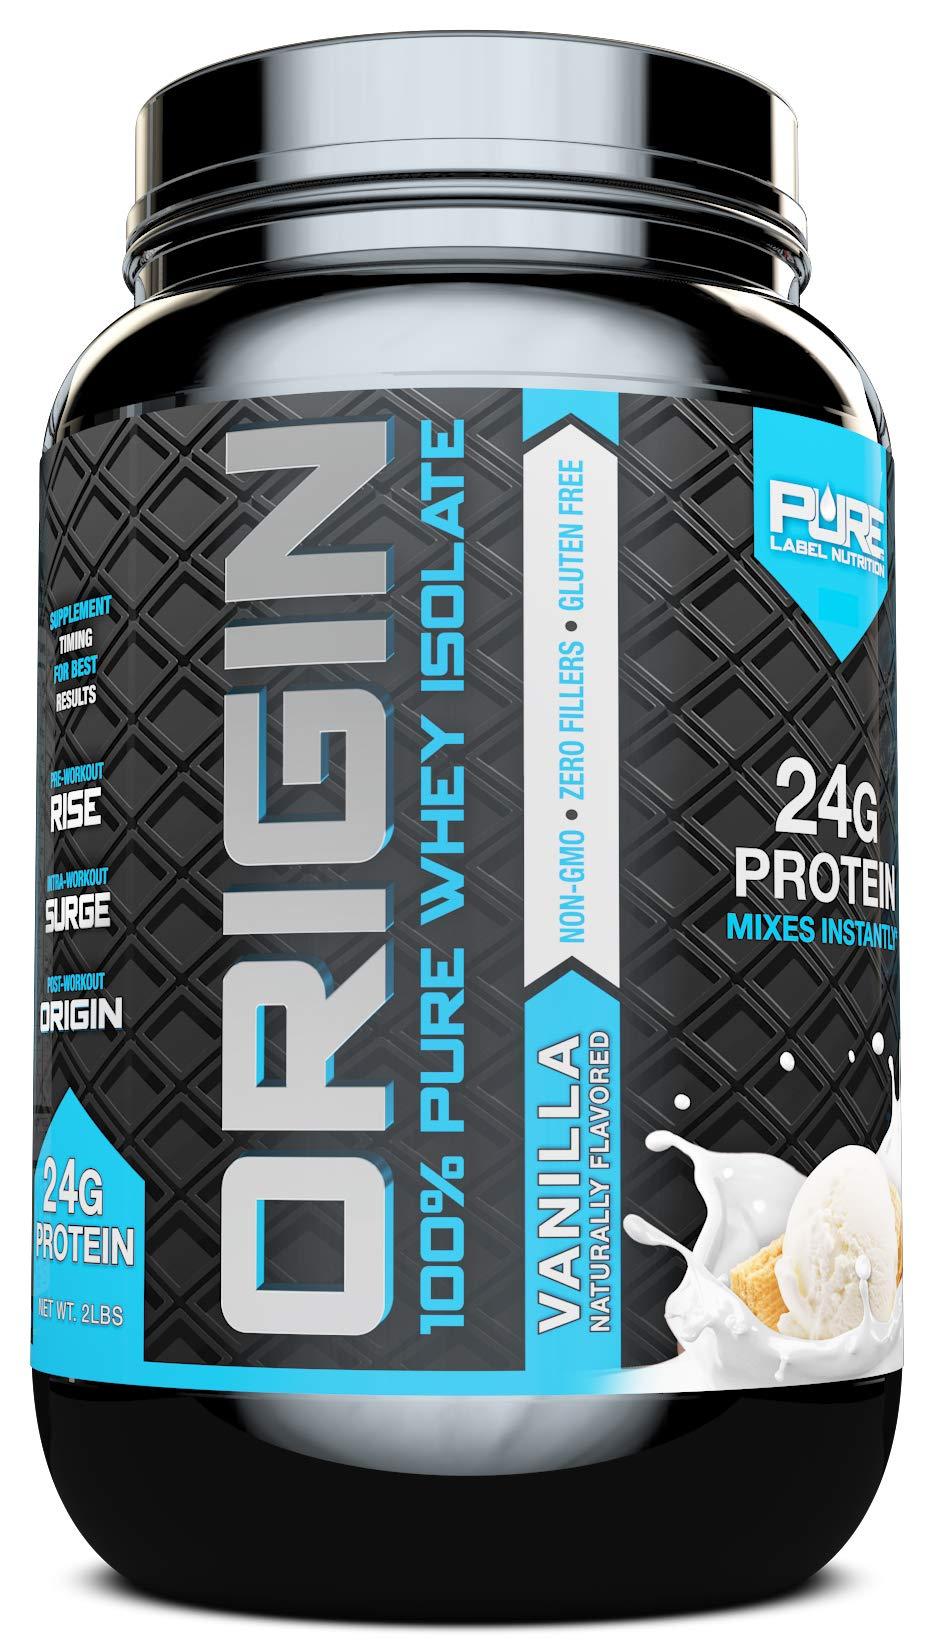 Whey Protein Isolate, Cold Processed Undenatured, Keto Friendly Whey Protein Powder, Non GMO, Gluten Free, Lactose Free, Sugar Free, 2 pounds (Vanilla) by Pure Label Nutrition